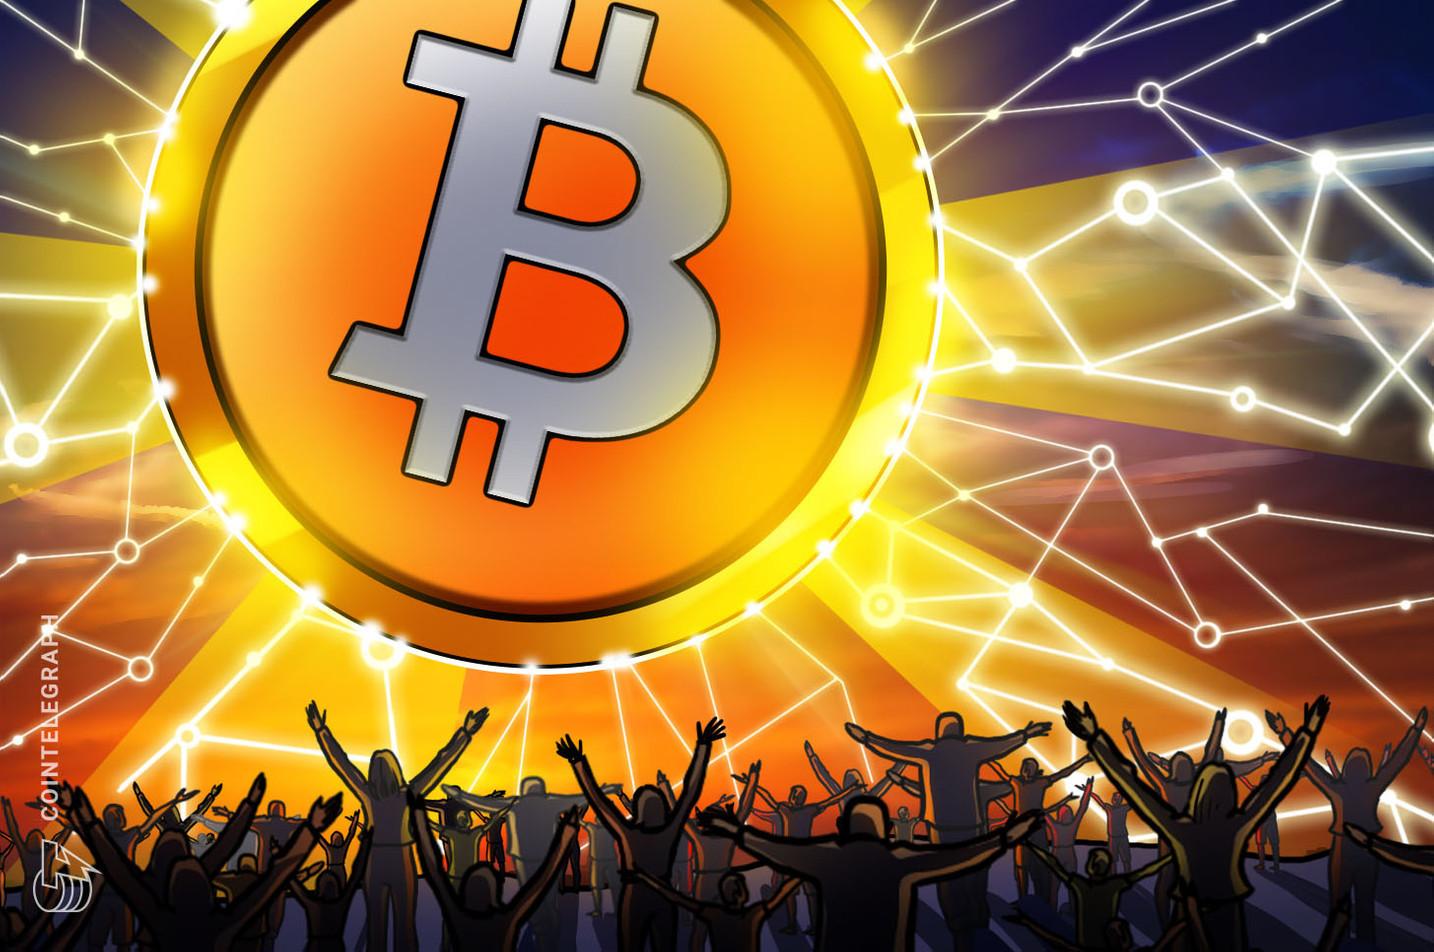 Se organizará charla digital para conversar sobre DeFi en Bitcoin